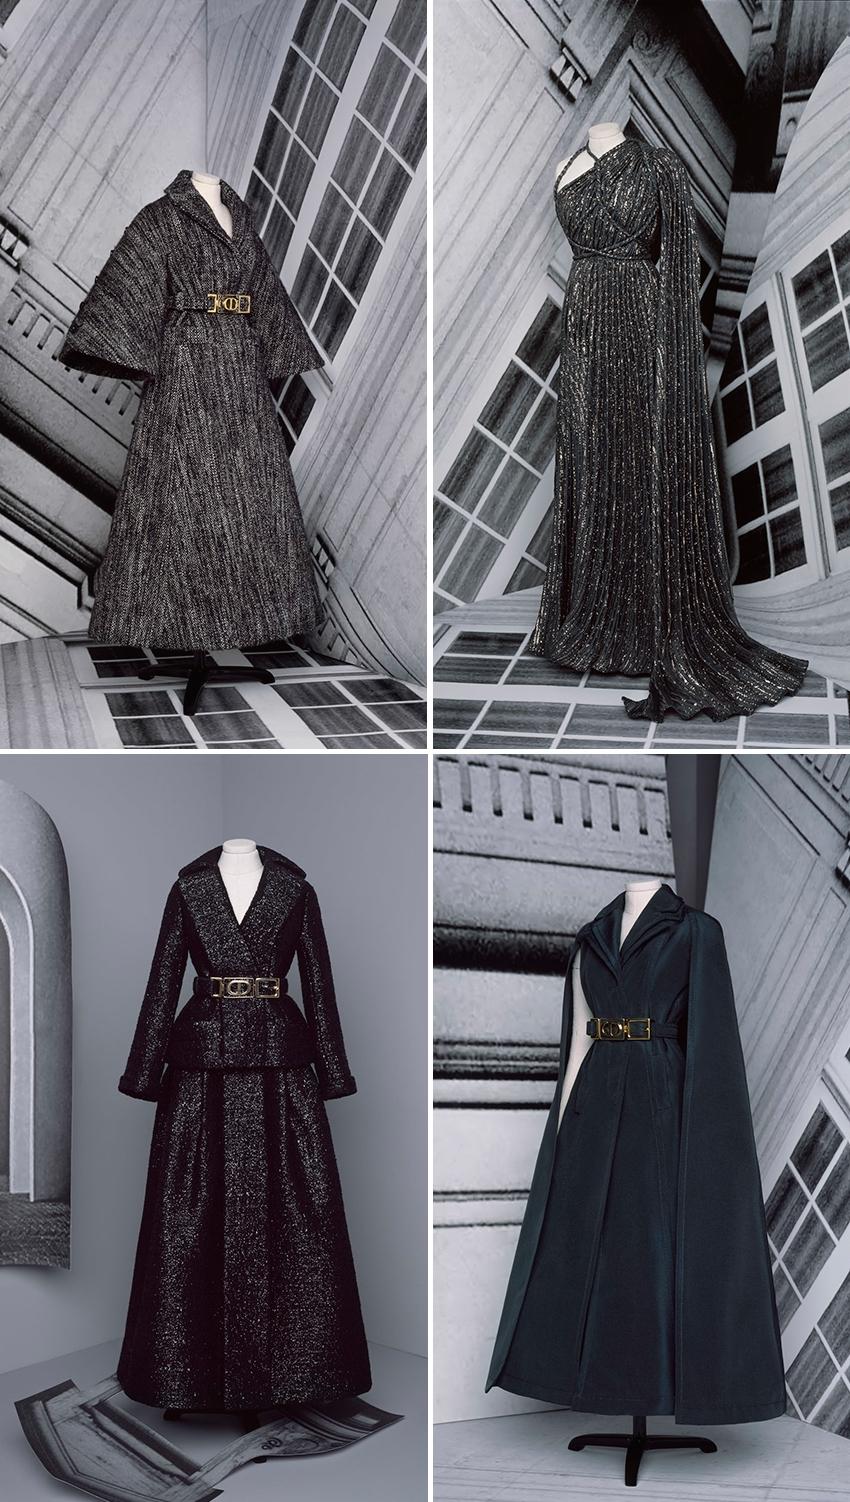 Dior Haute Couture F/W poetic savoir fare 2020-21 collection